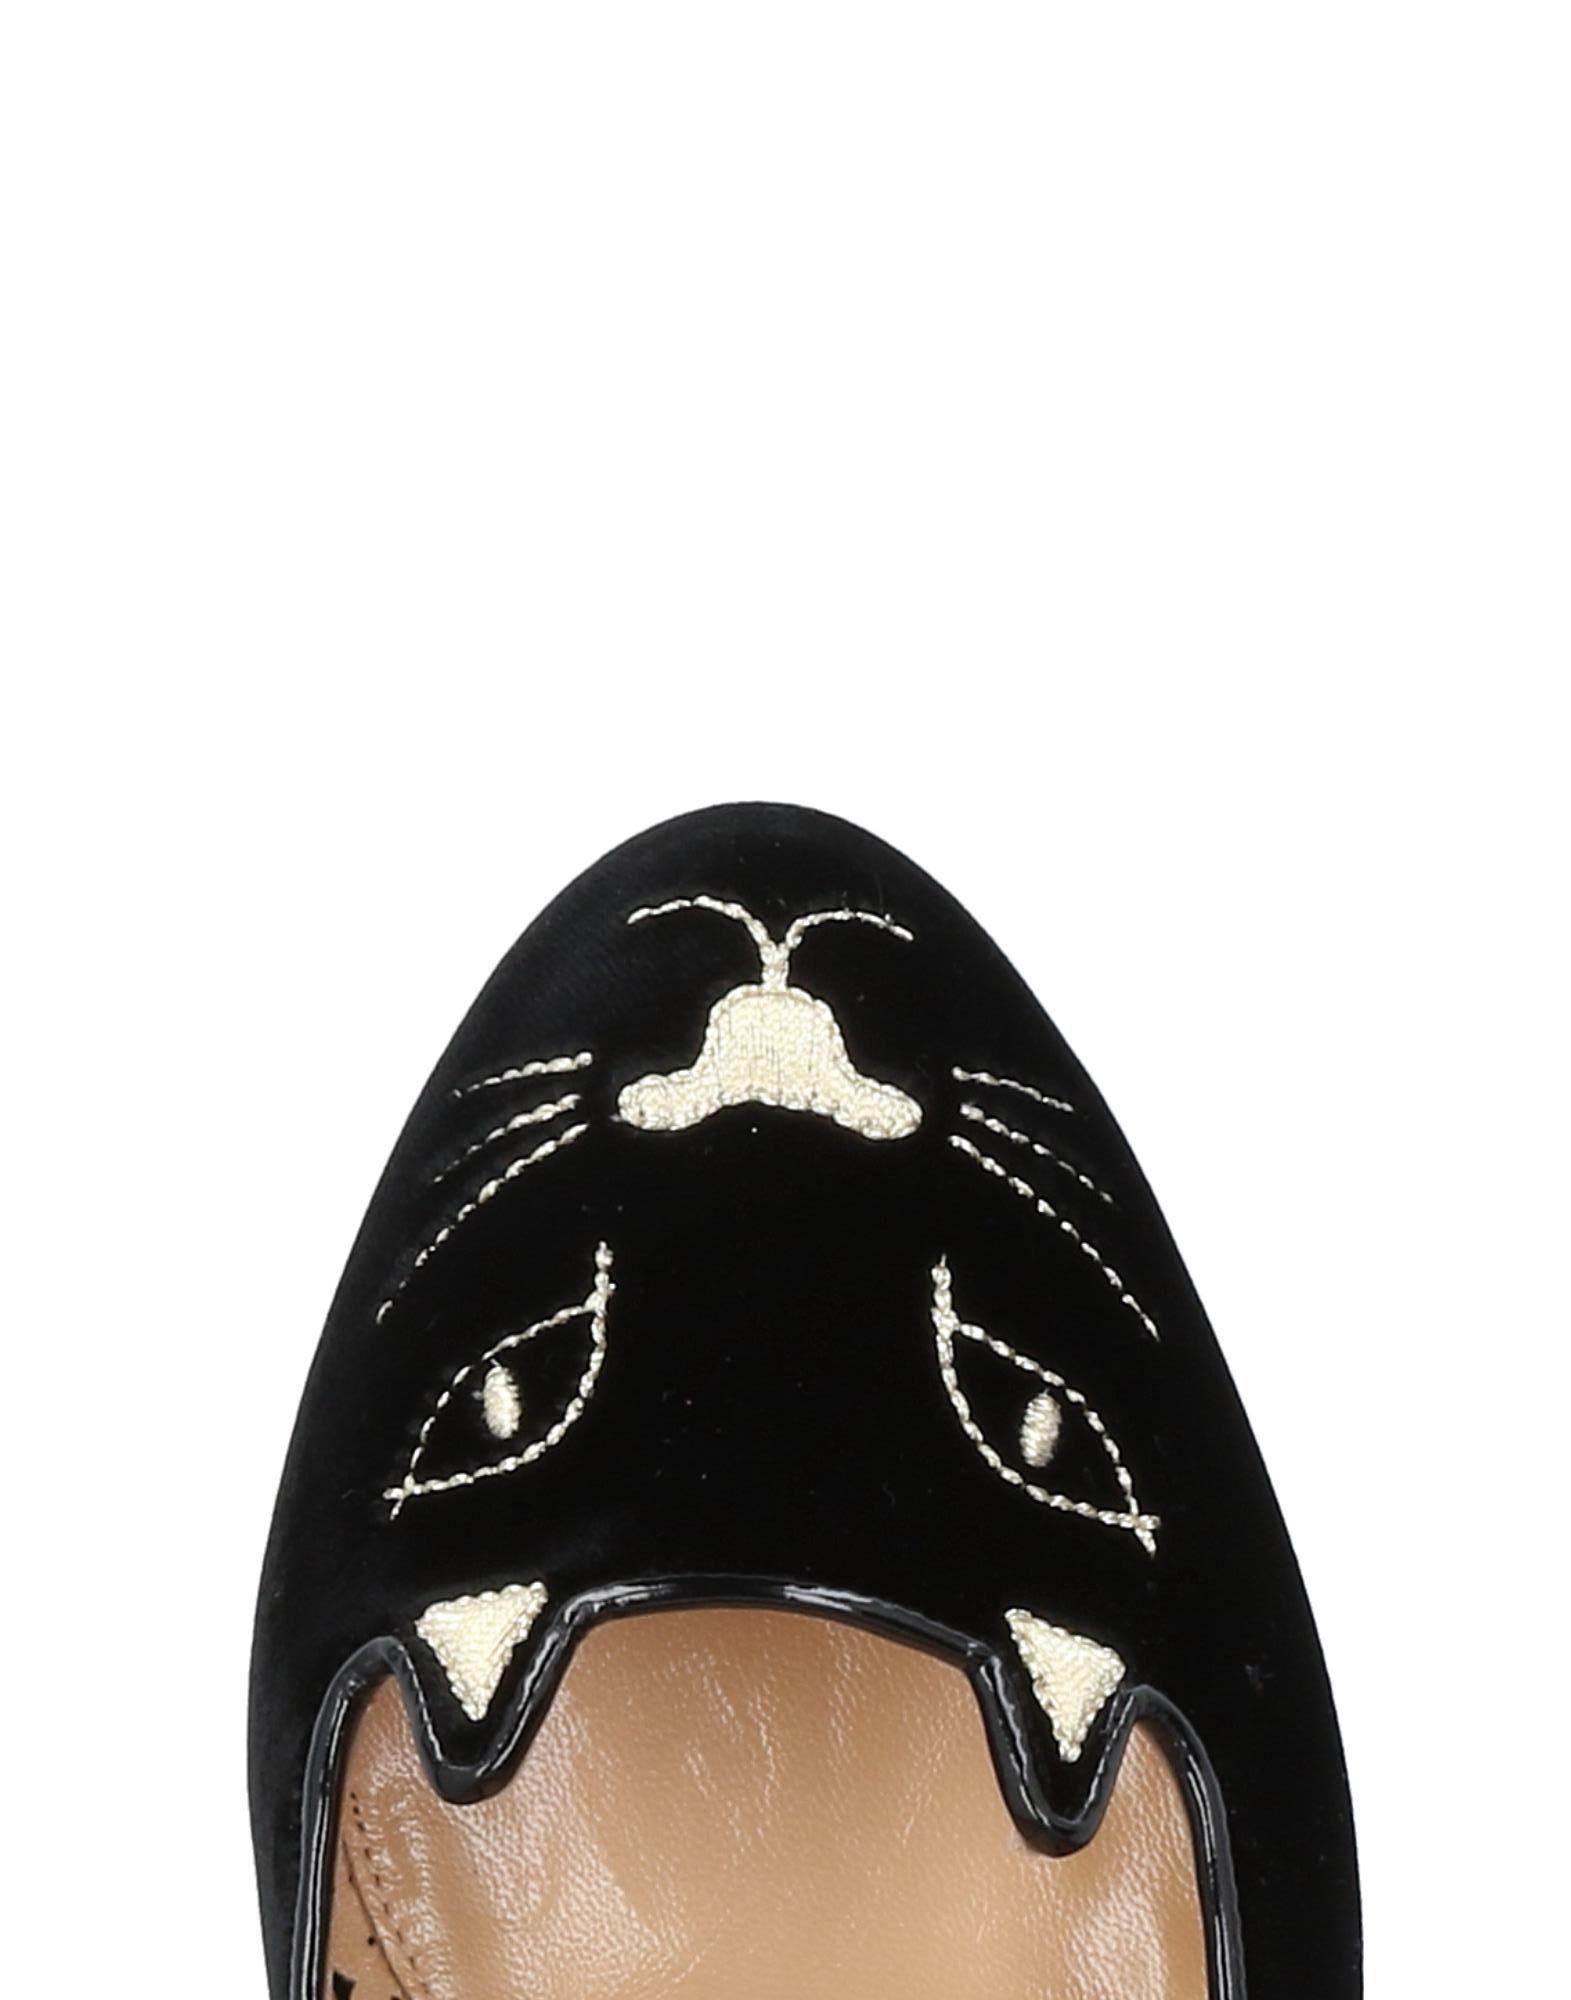 Rabatt Damen Schuhe Charlotte Olympia Pumps Damen Rabatt  11491607RV 0399c1